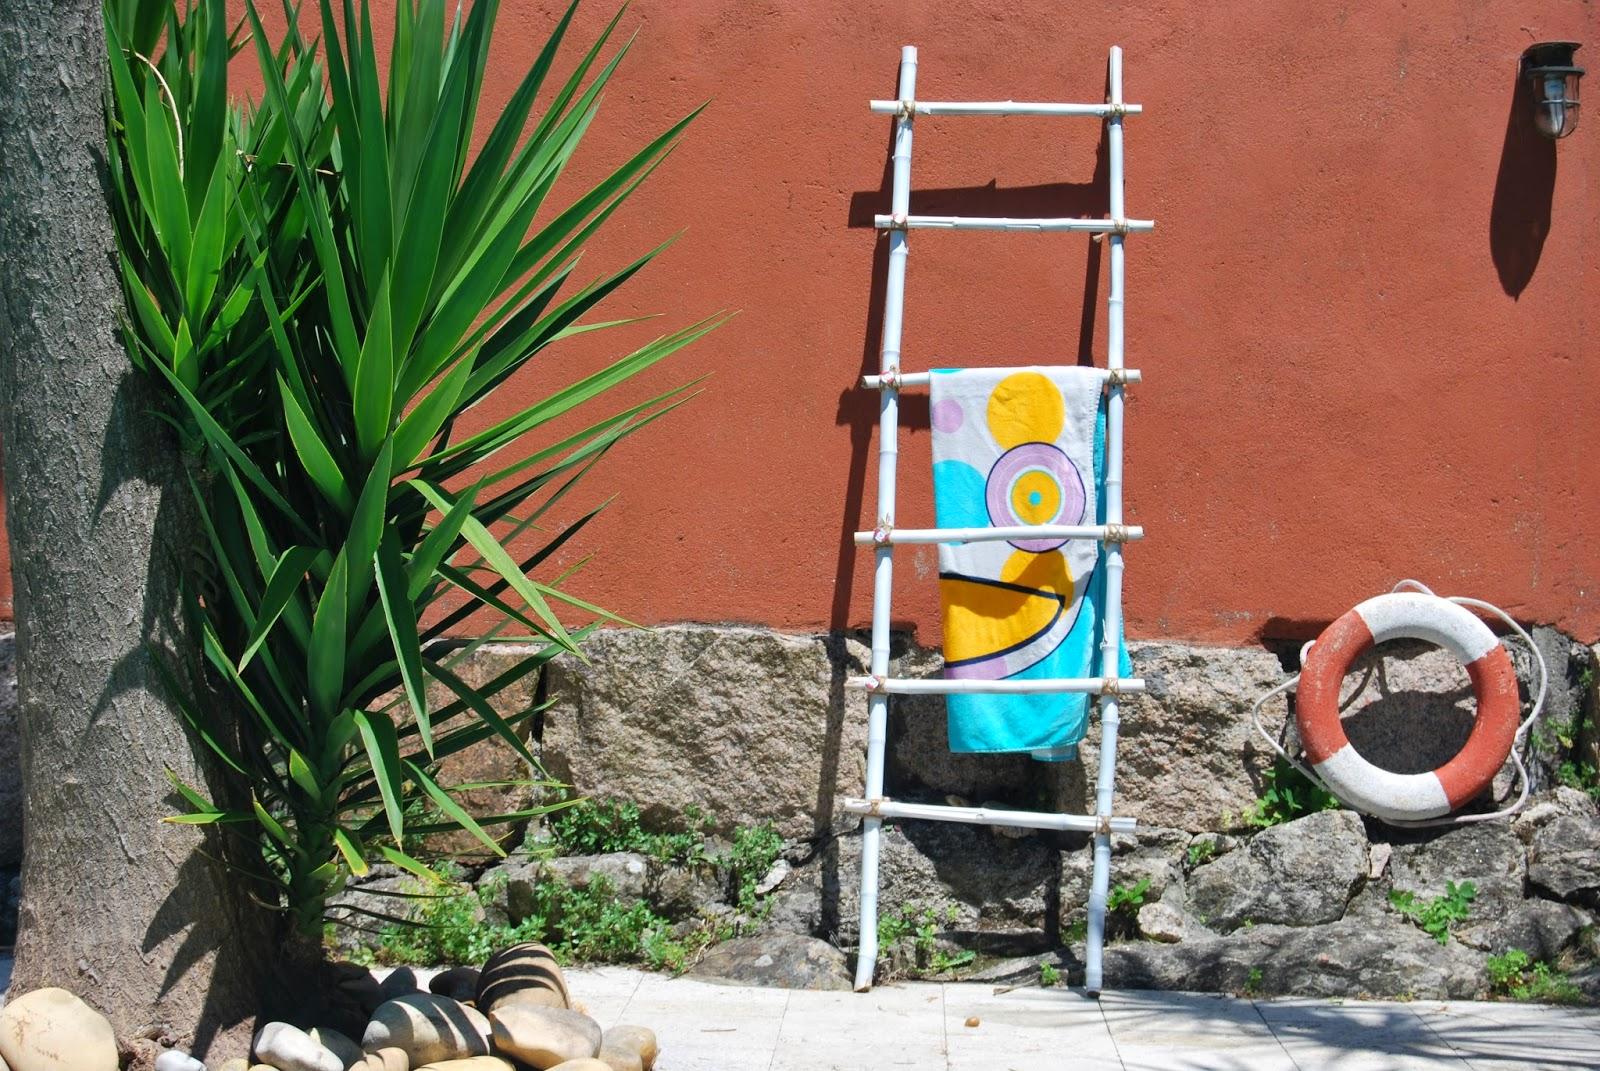 http://sosunnyblog.blogspot.pt/2014/07/troncos-rotuladores-y-chapas-reto-diy.html